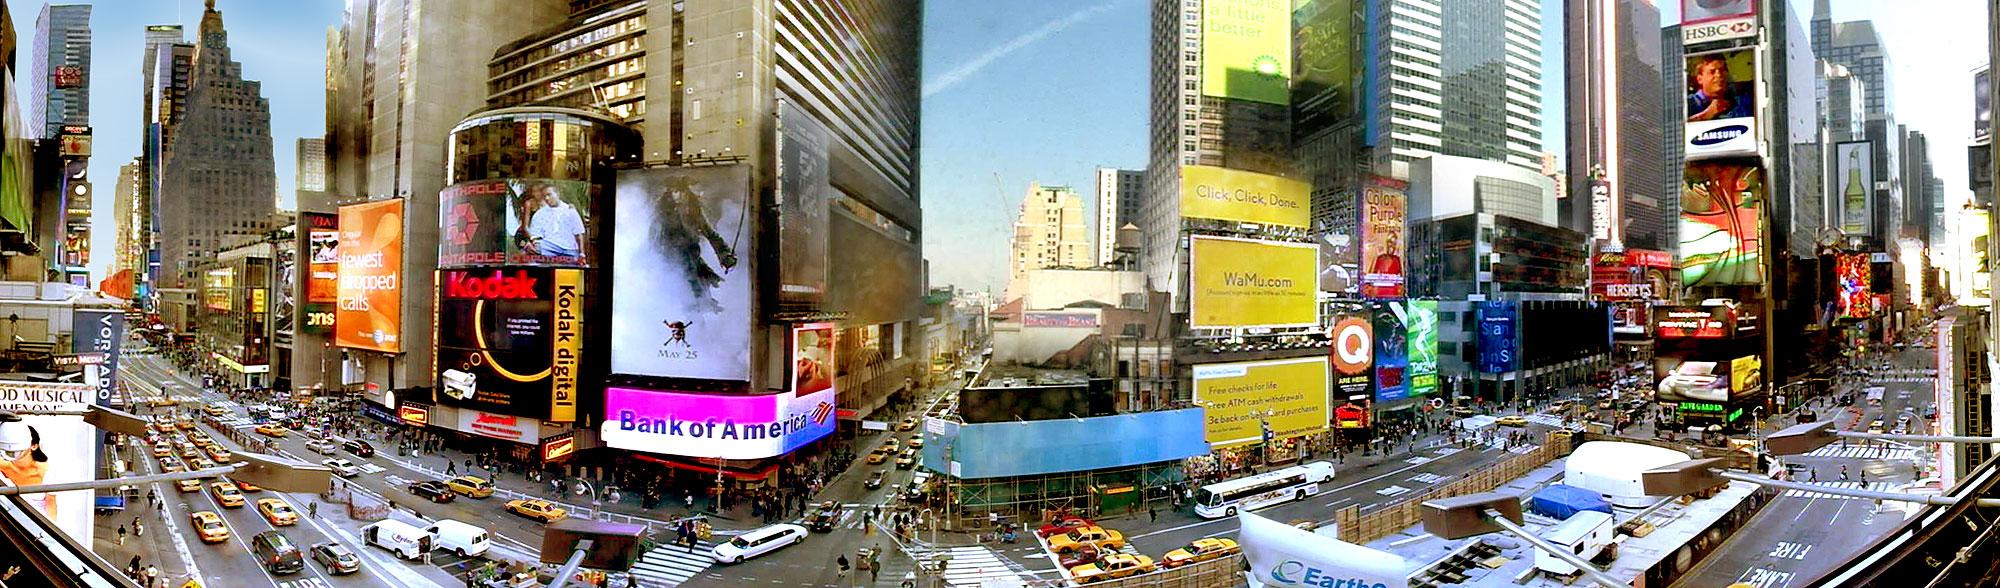 Coronavirus hits new york hard as times square looks like a disaster image